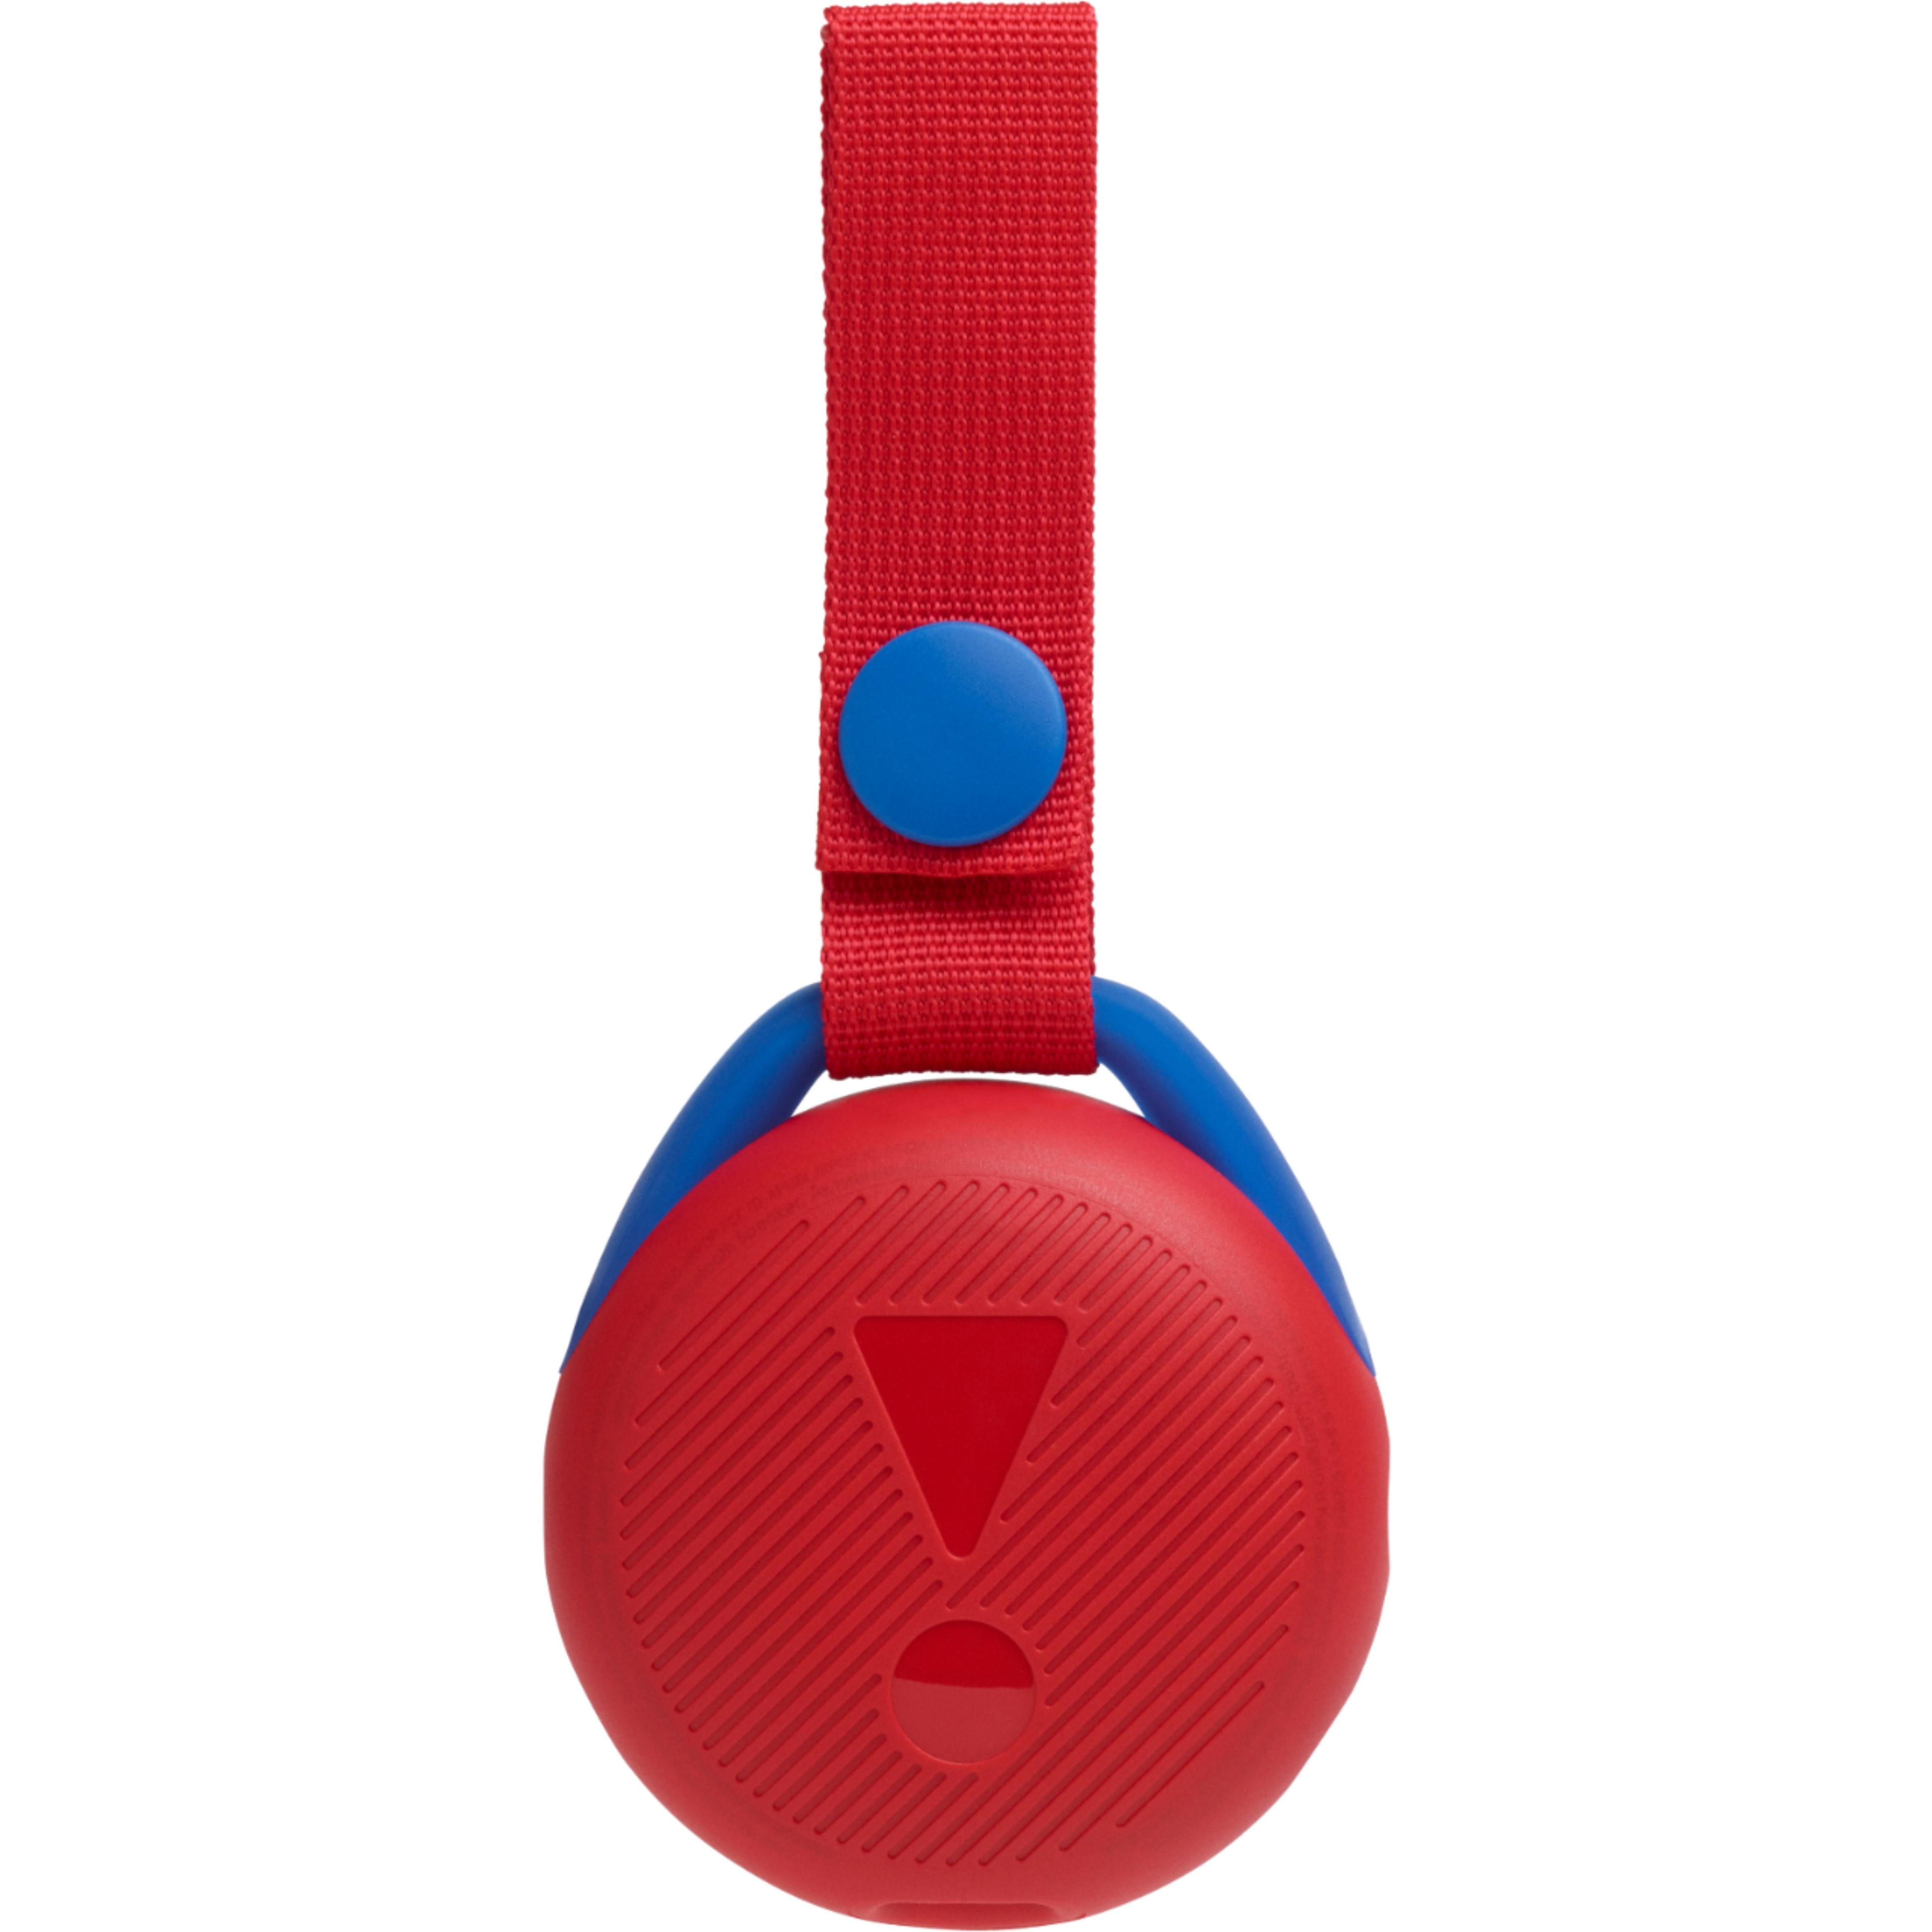 JBL - JR POP Portable Bluetooth Speaker - Apple Red